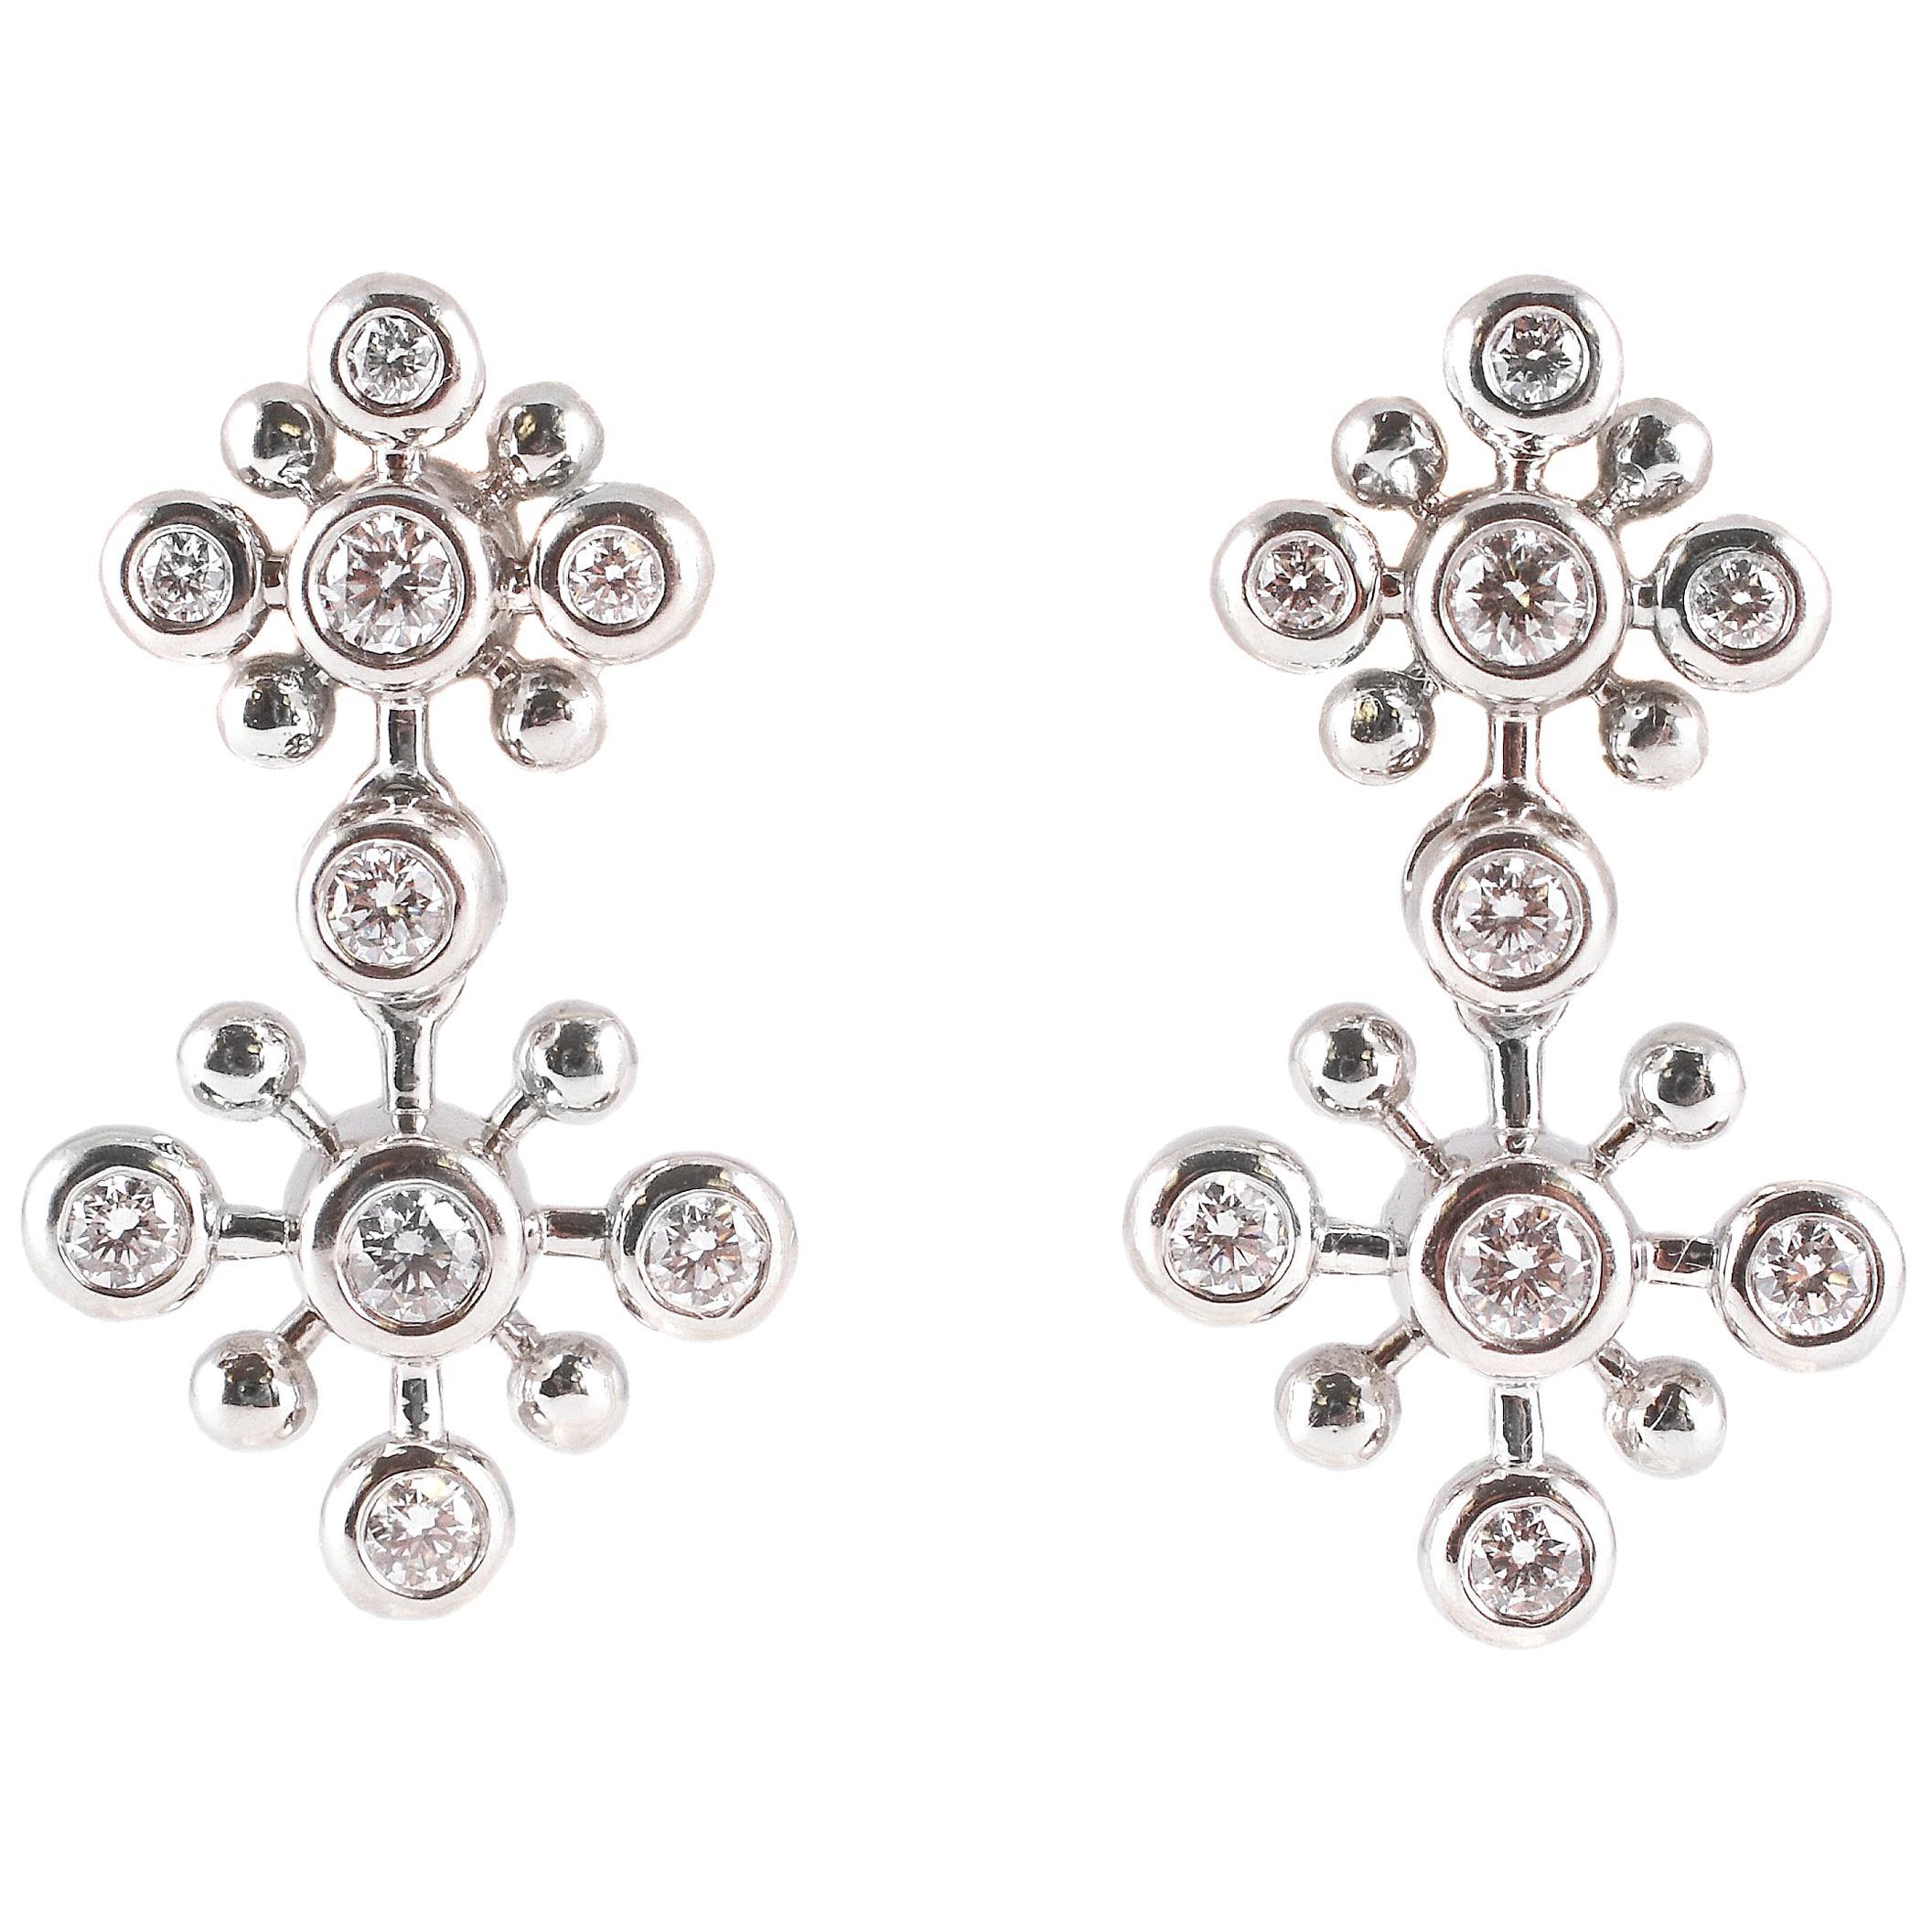 1.25 Carat Diamond Snowflake Earrings